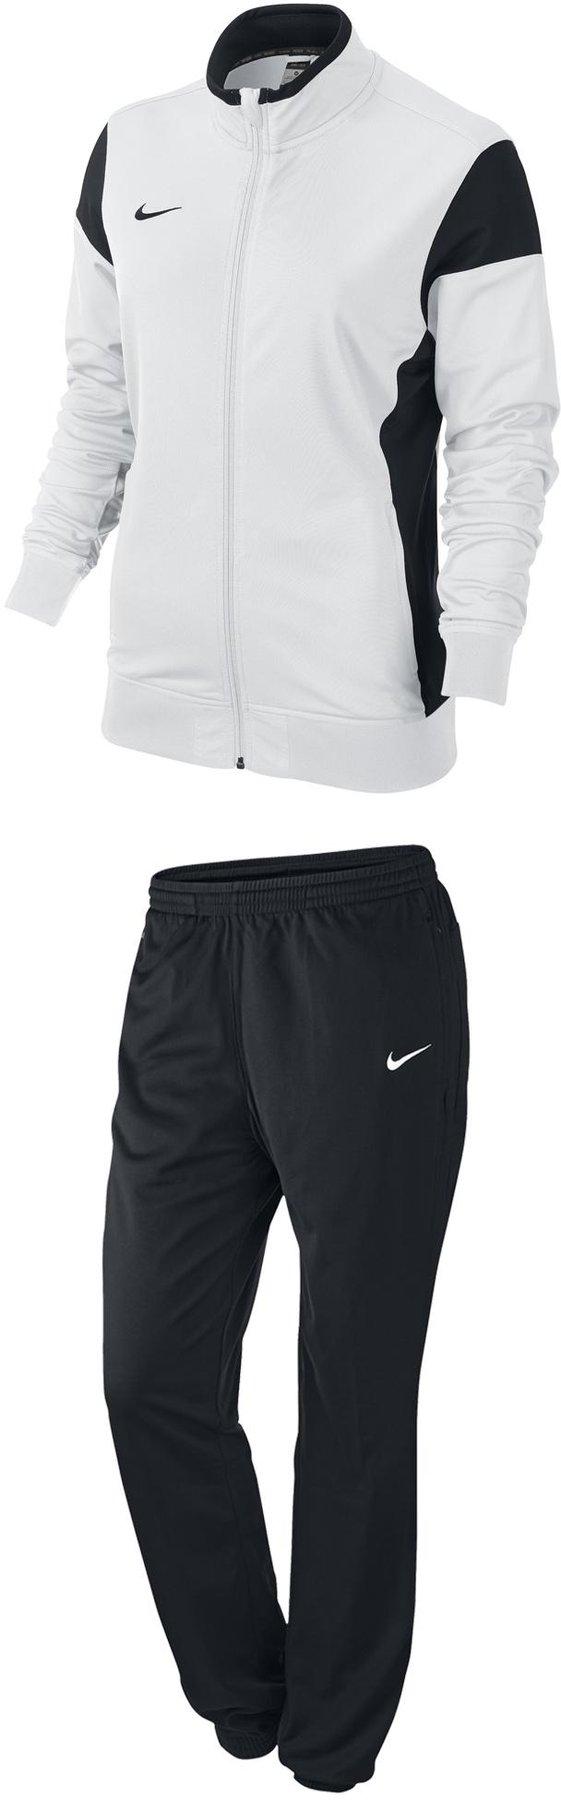 Nike Trainingsanzug Damen